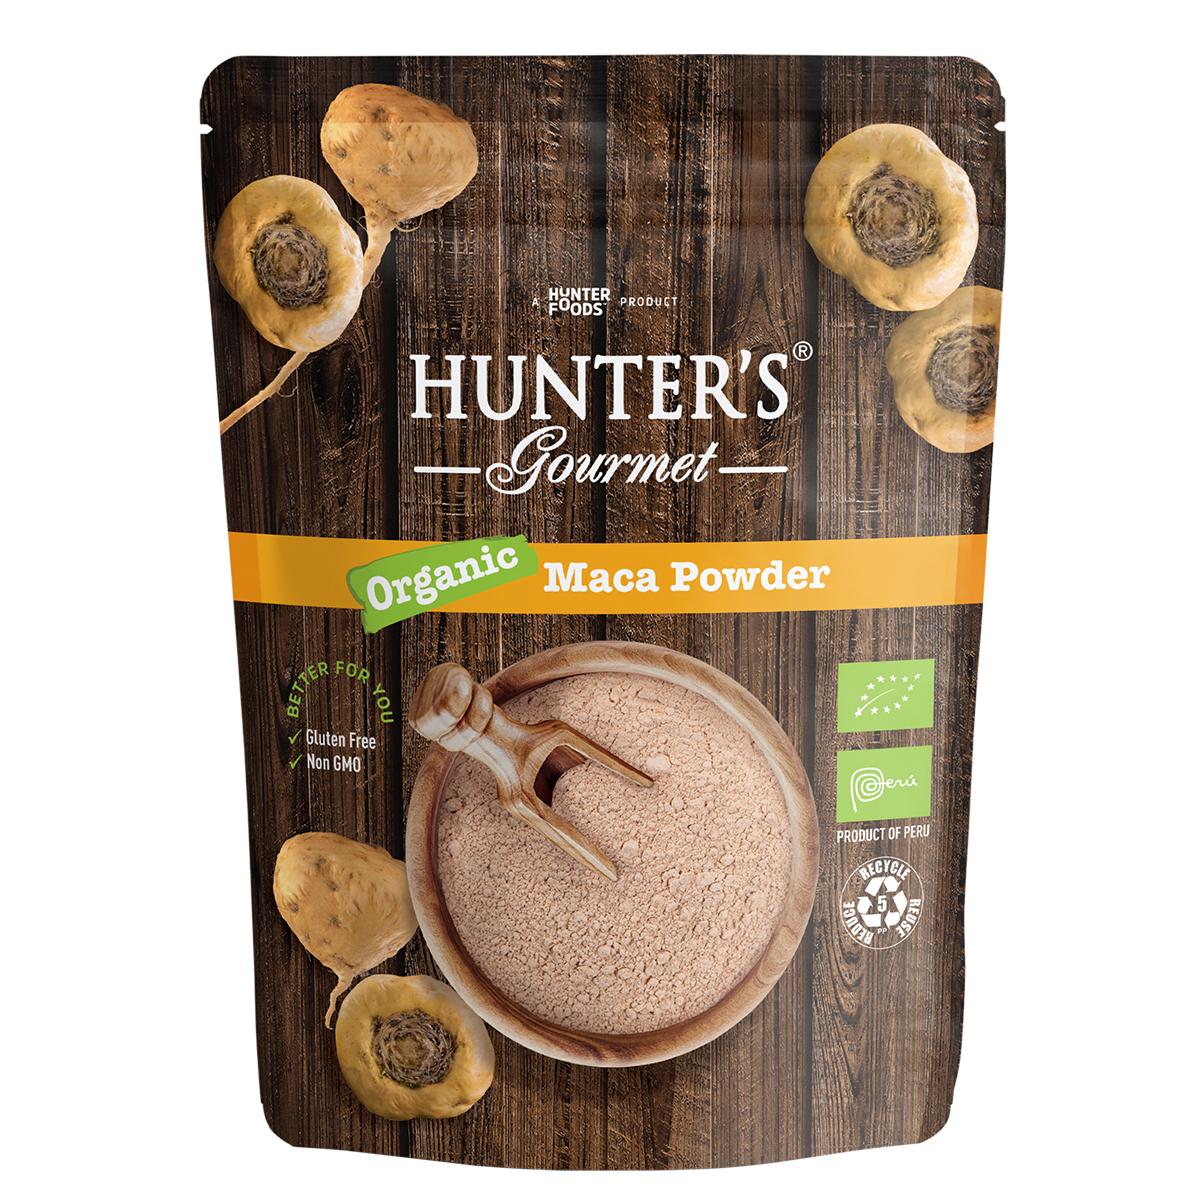 Hunter's Gourmet Organic Flax Seeds (300gm)